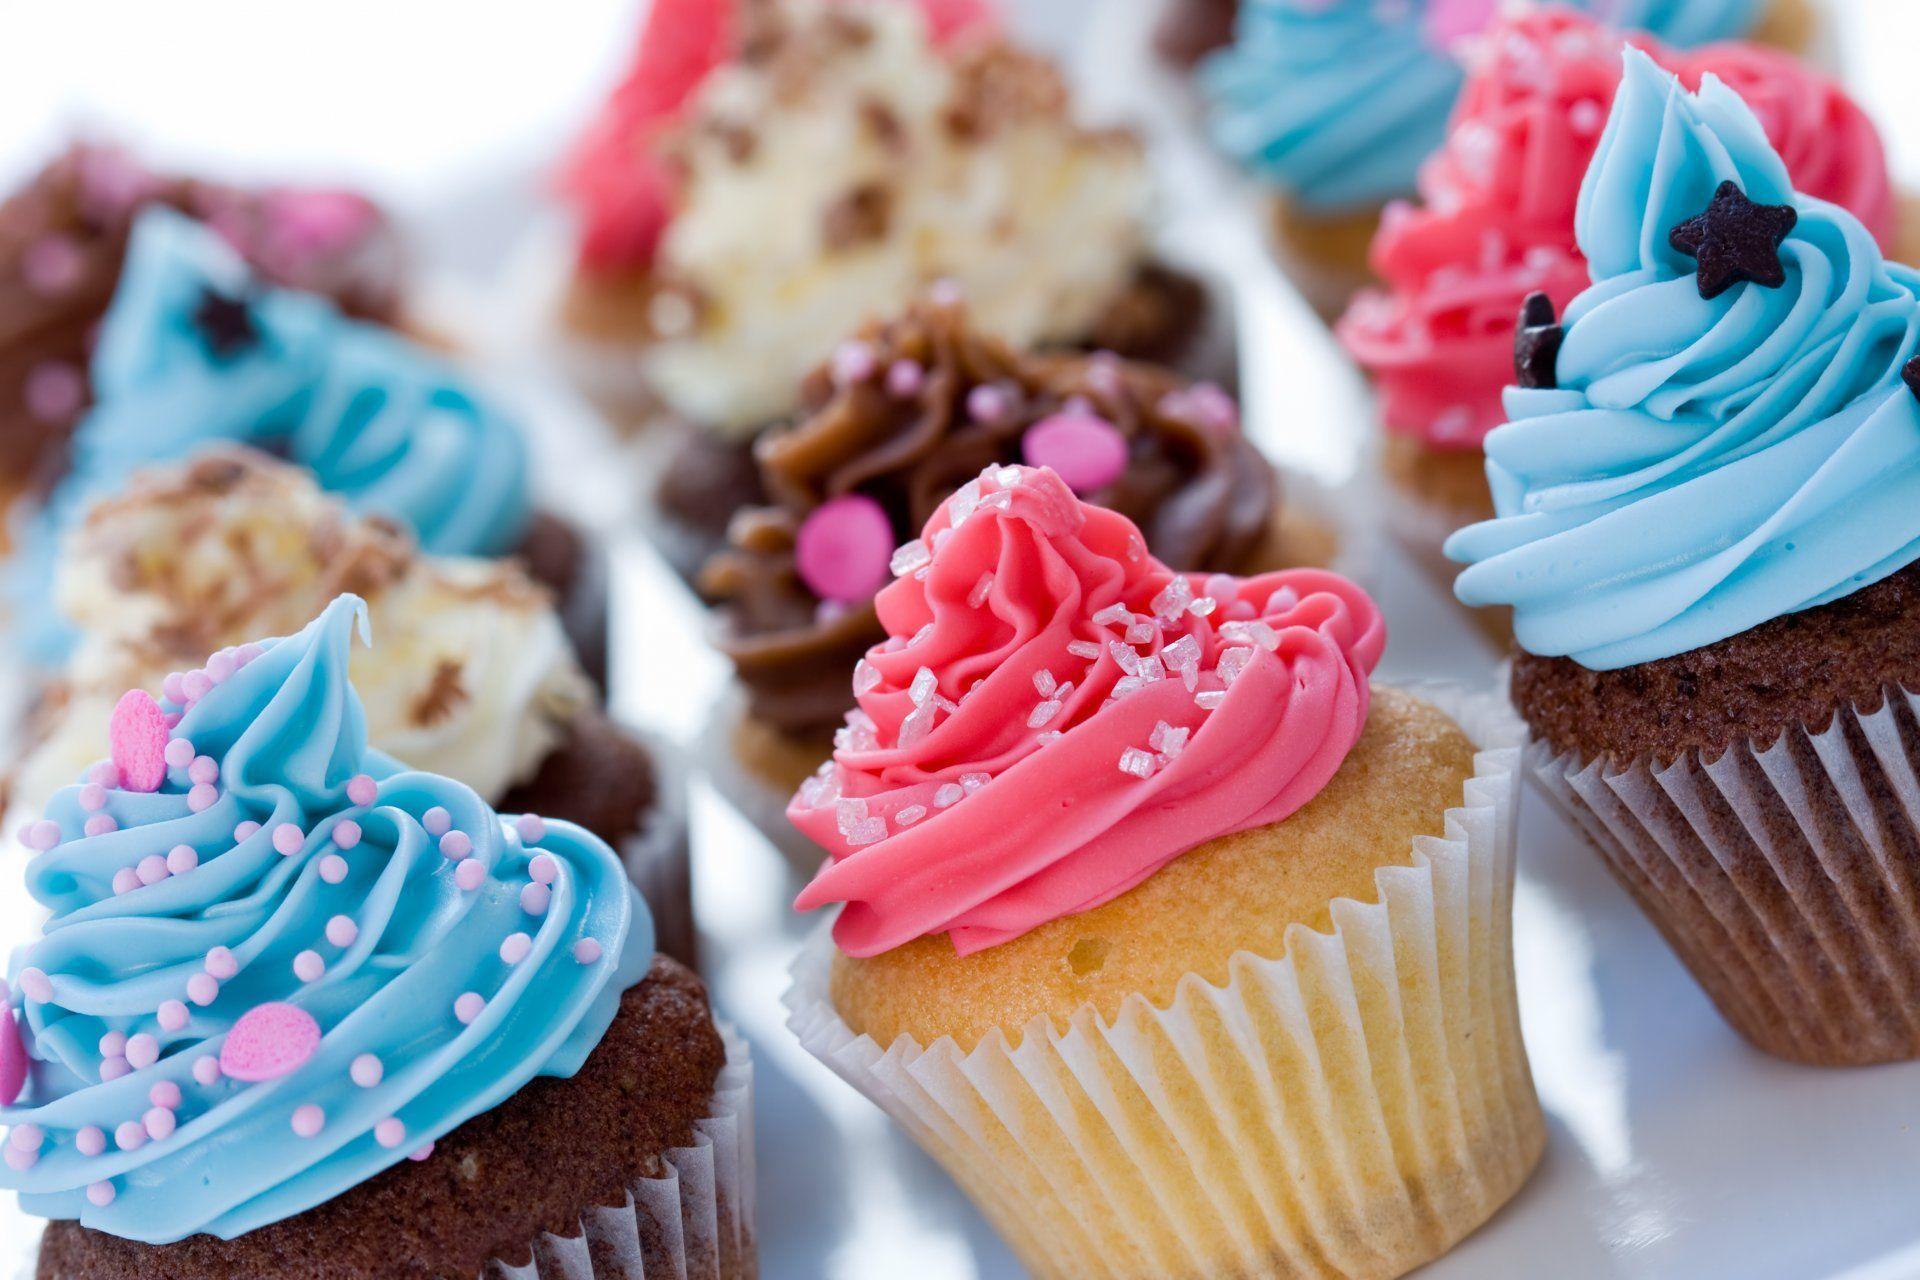 cupcakes cream chocolate decoration assorted baking sweet dessert ...